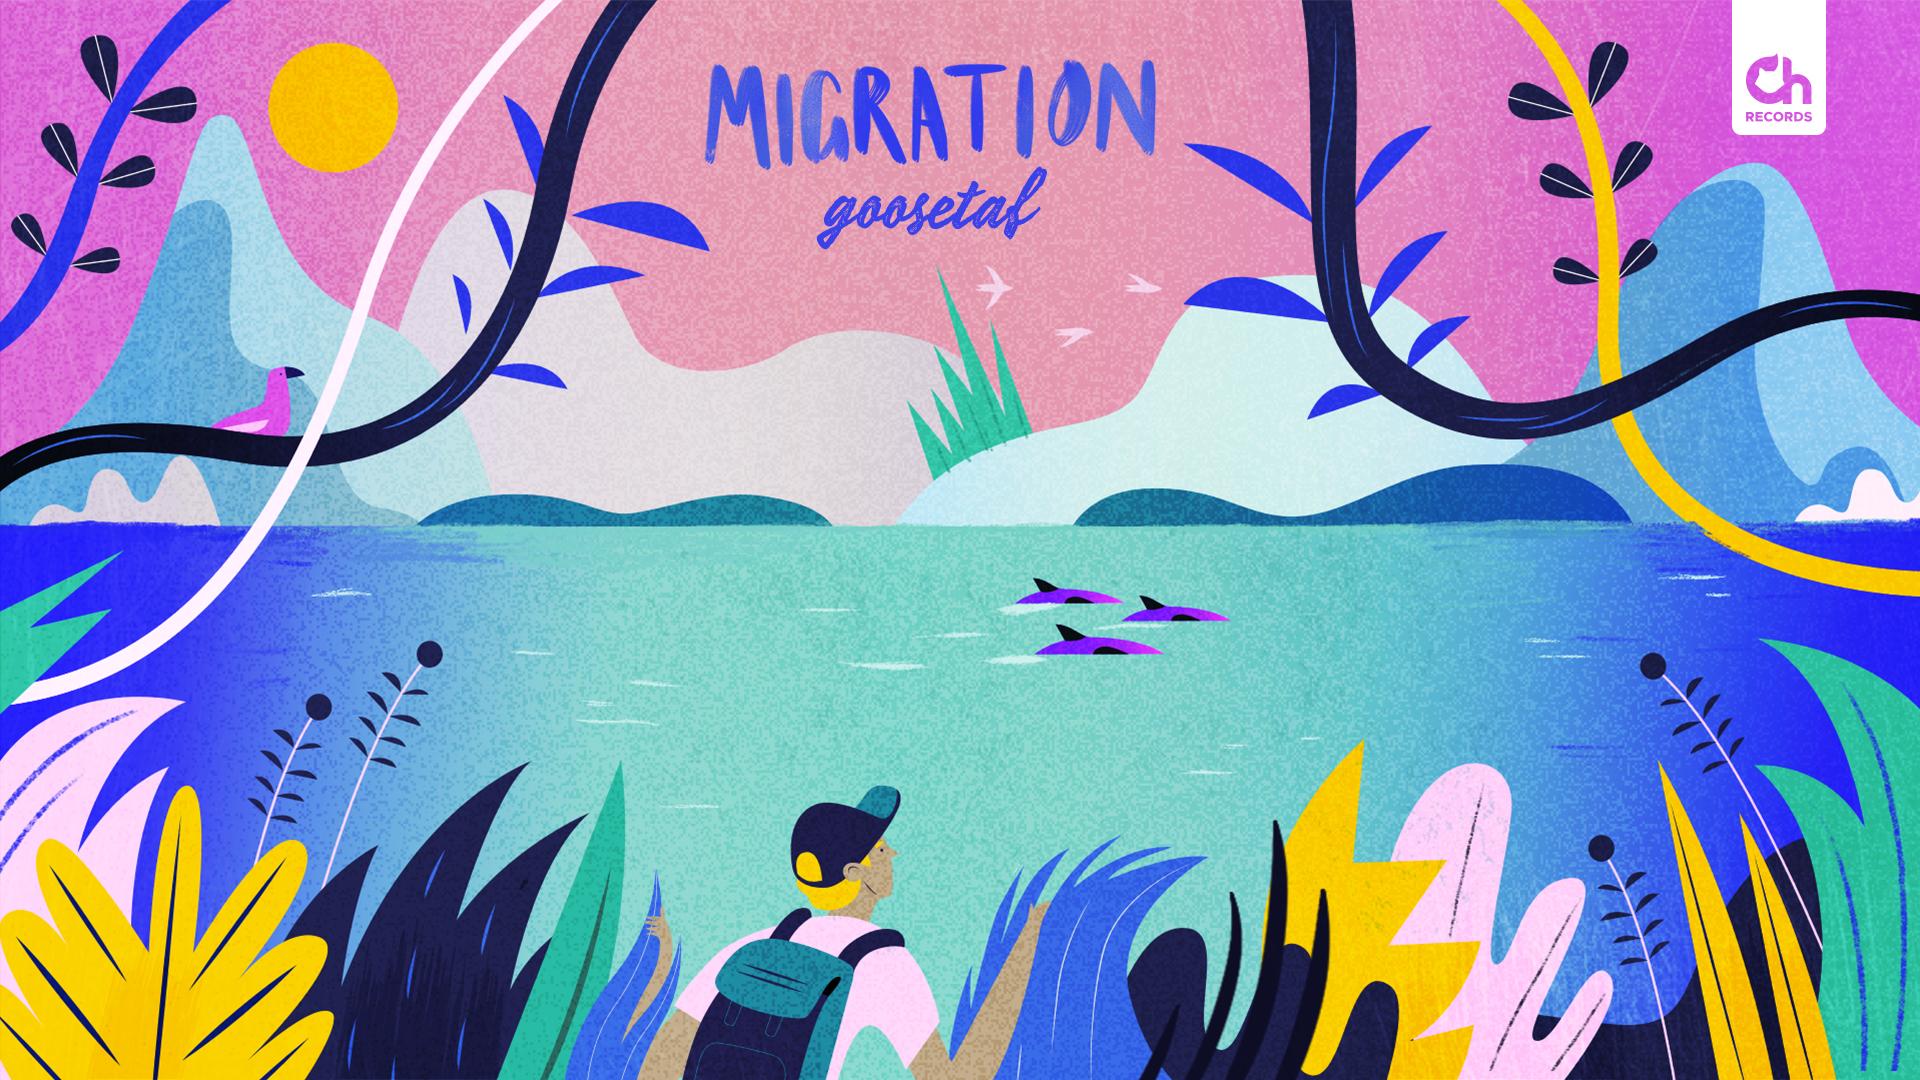 Chillhop-Goosetaf-Migration-EP-sofiavarano.jpg